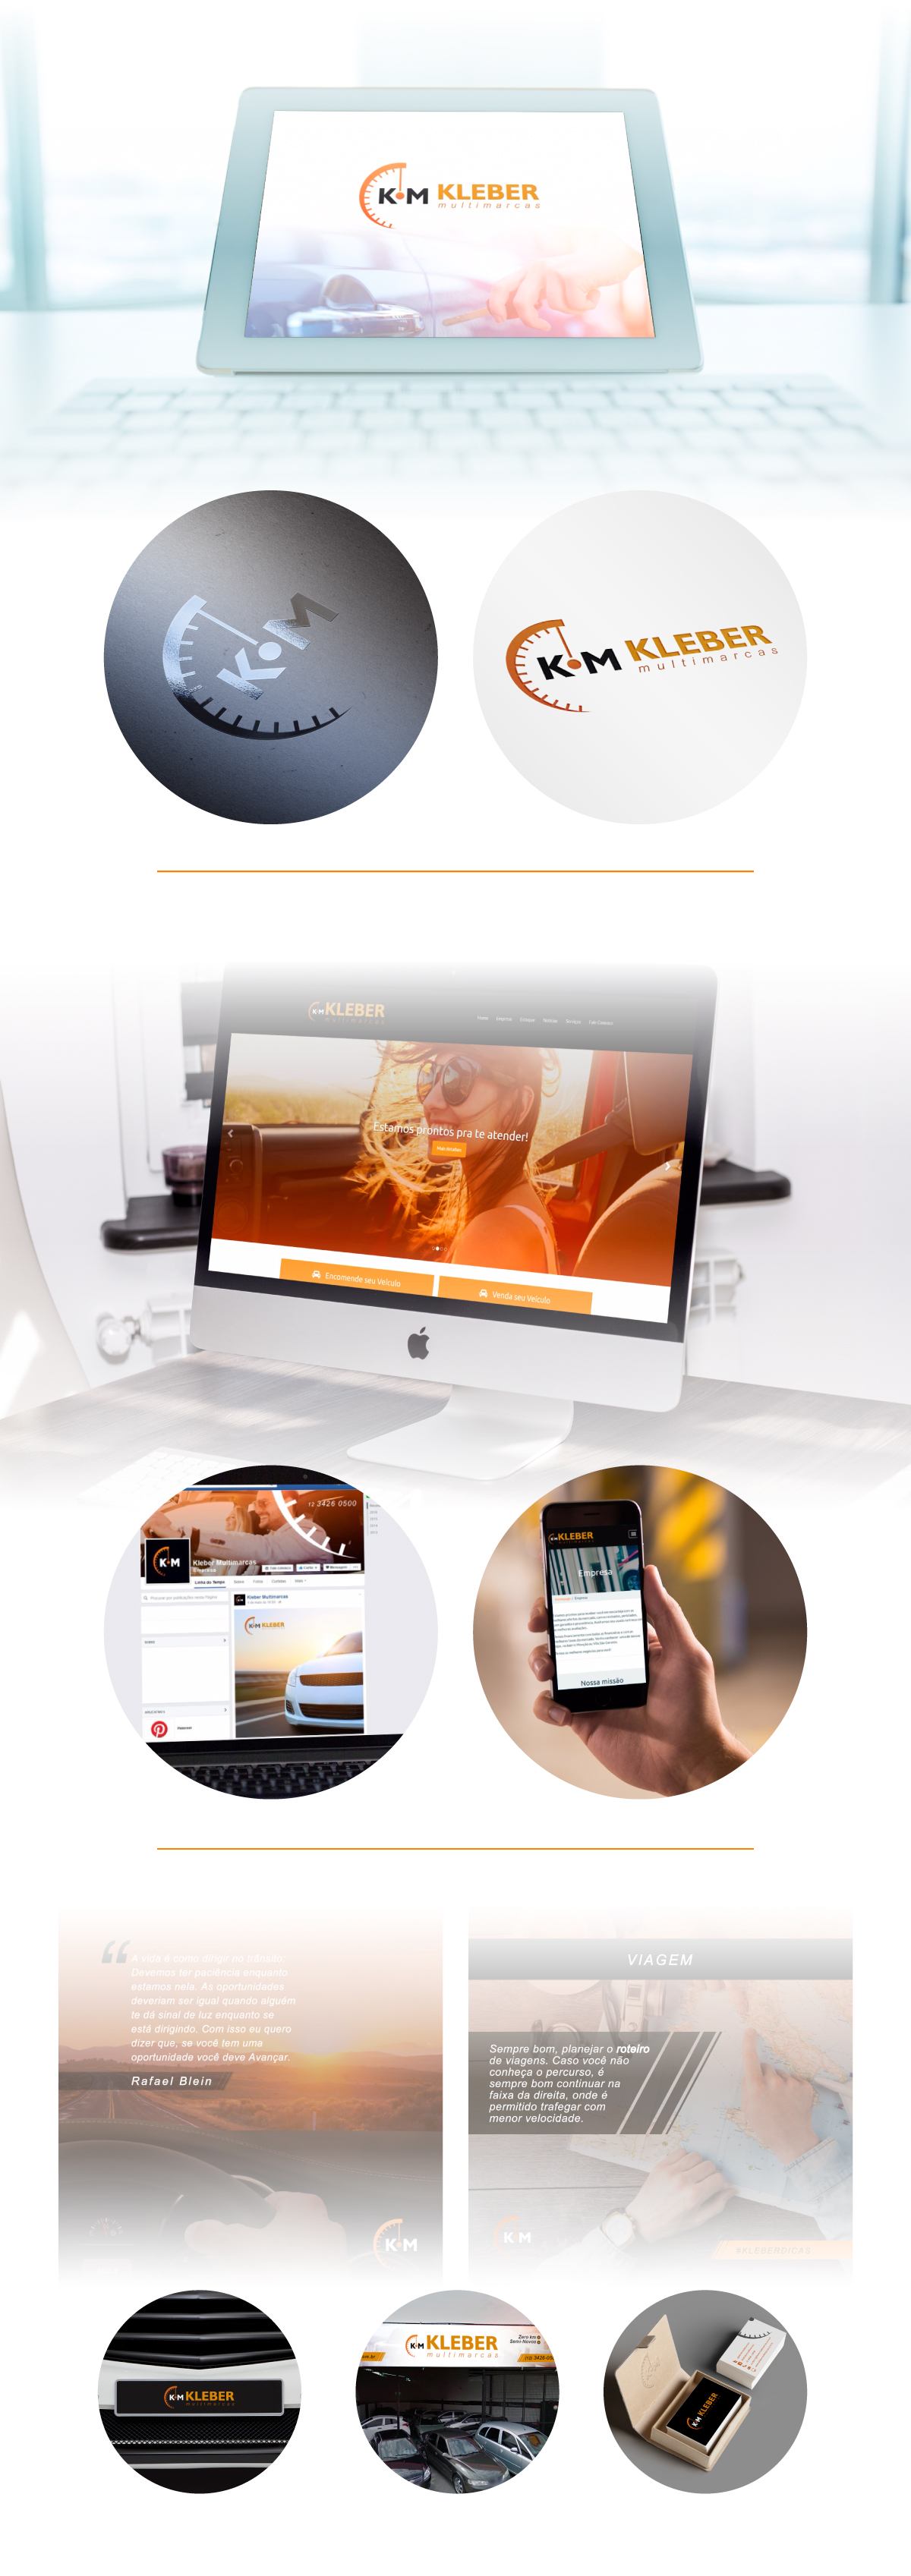 web4-comunicacao-identidade-site-facebook-kleber-portfolio-complete